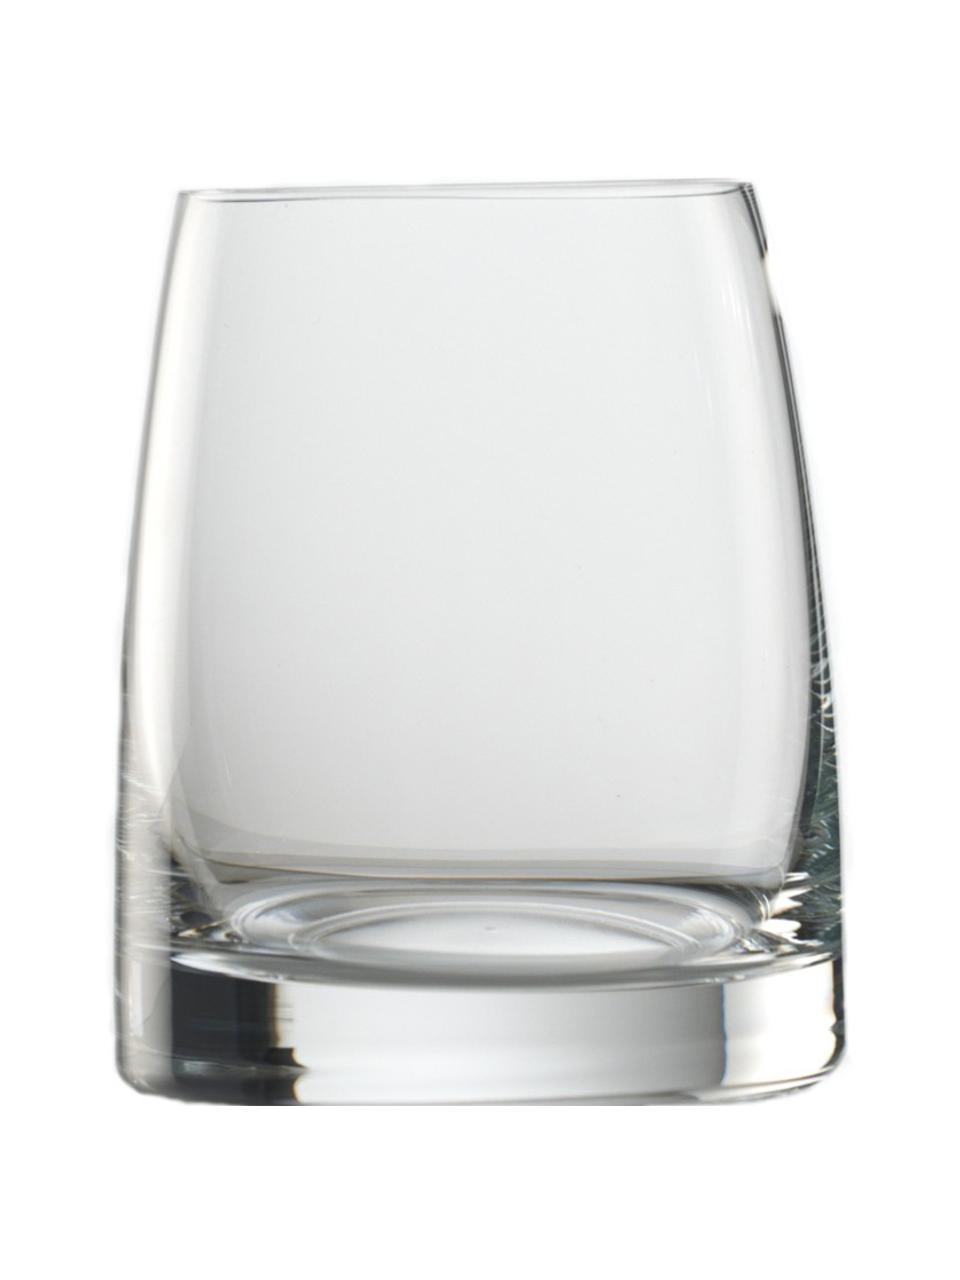 Kristallen waterglazenset Experience, 6-delig, Kristalglas, Transparant, Ø 8 x H 9 cm